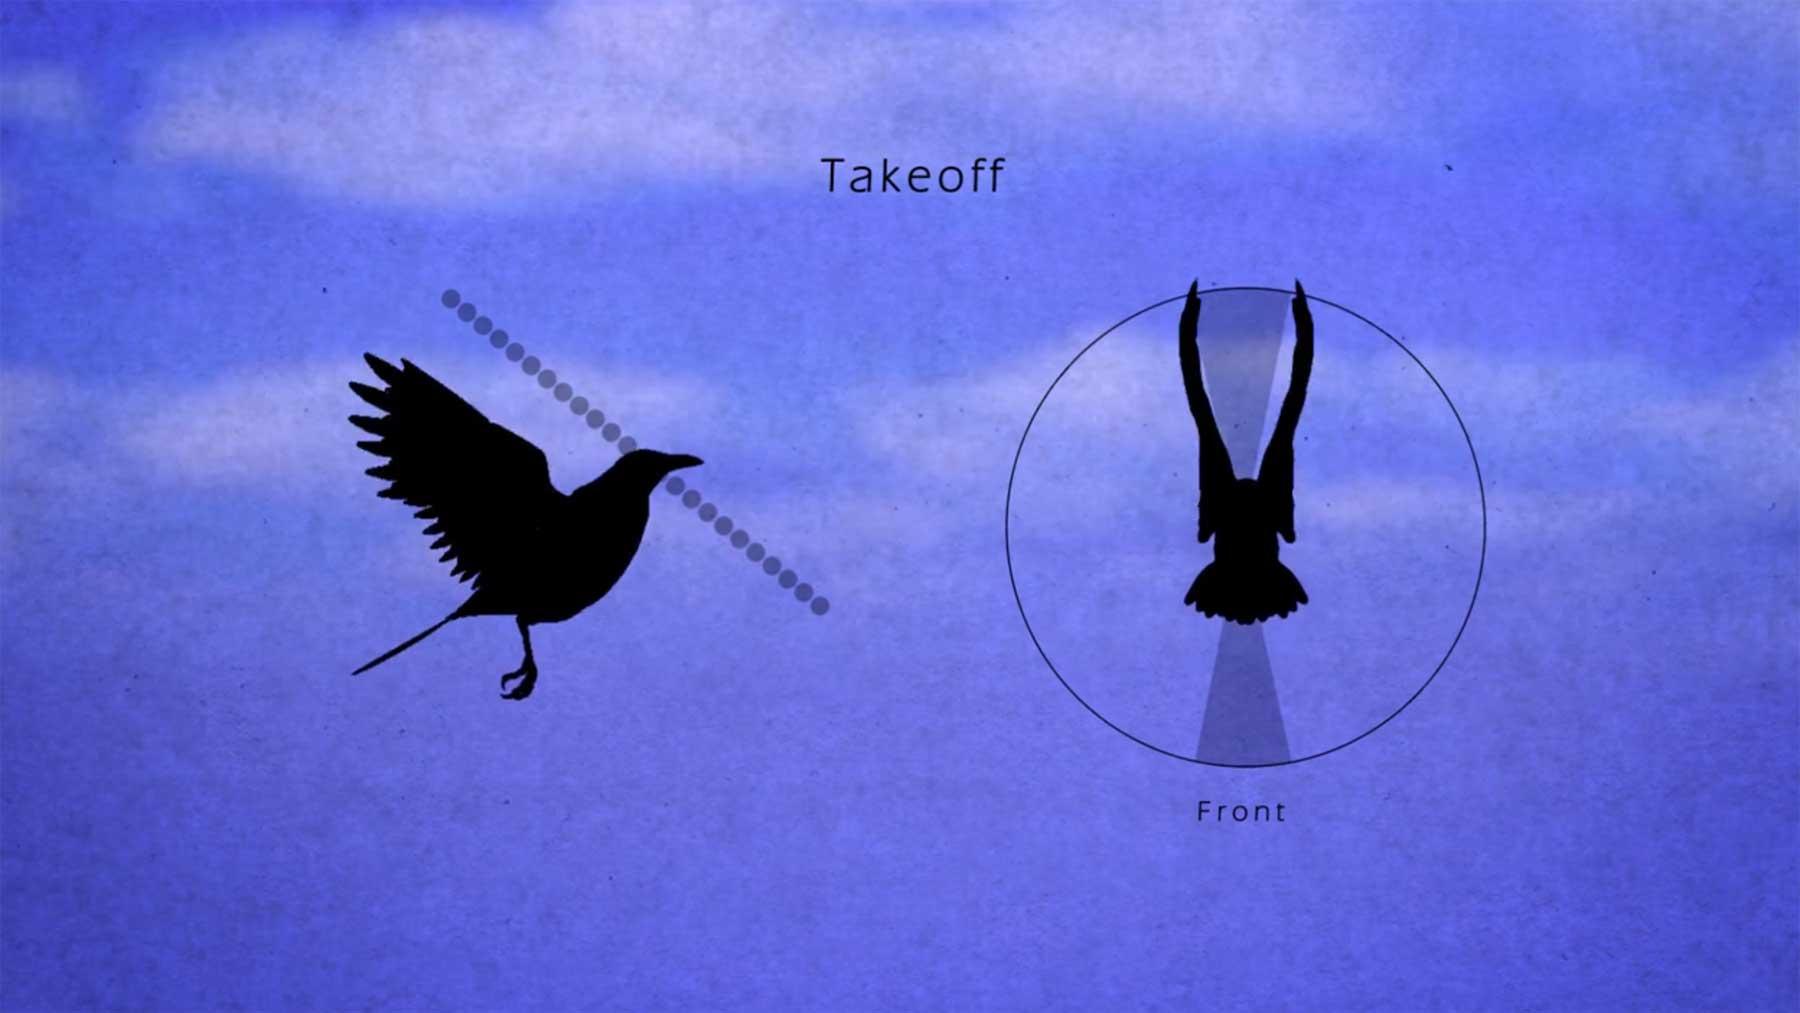 Bewegungsmuster von Vögeln